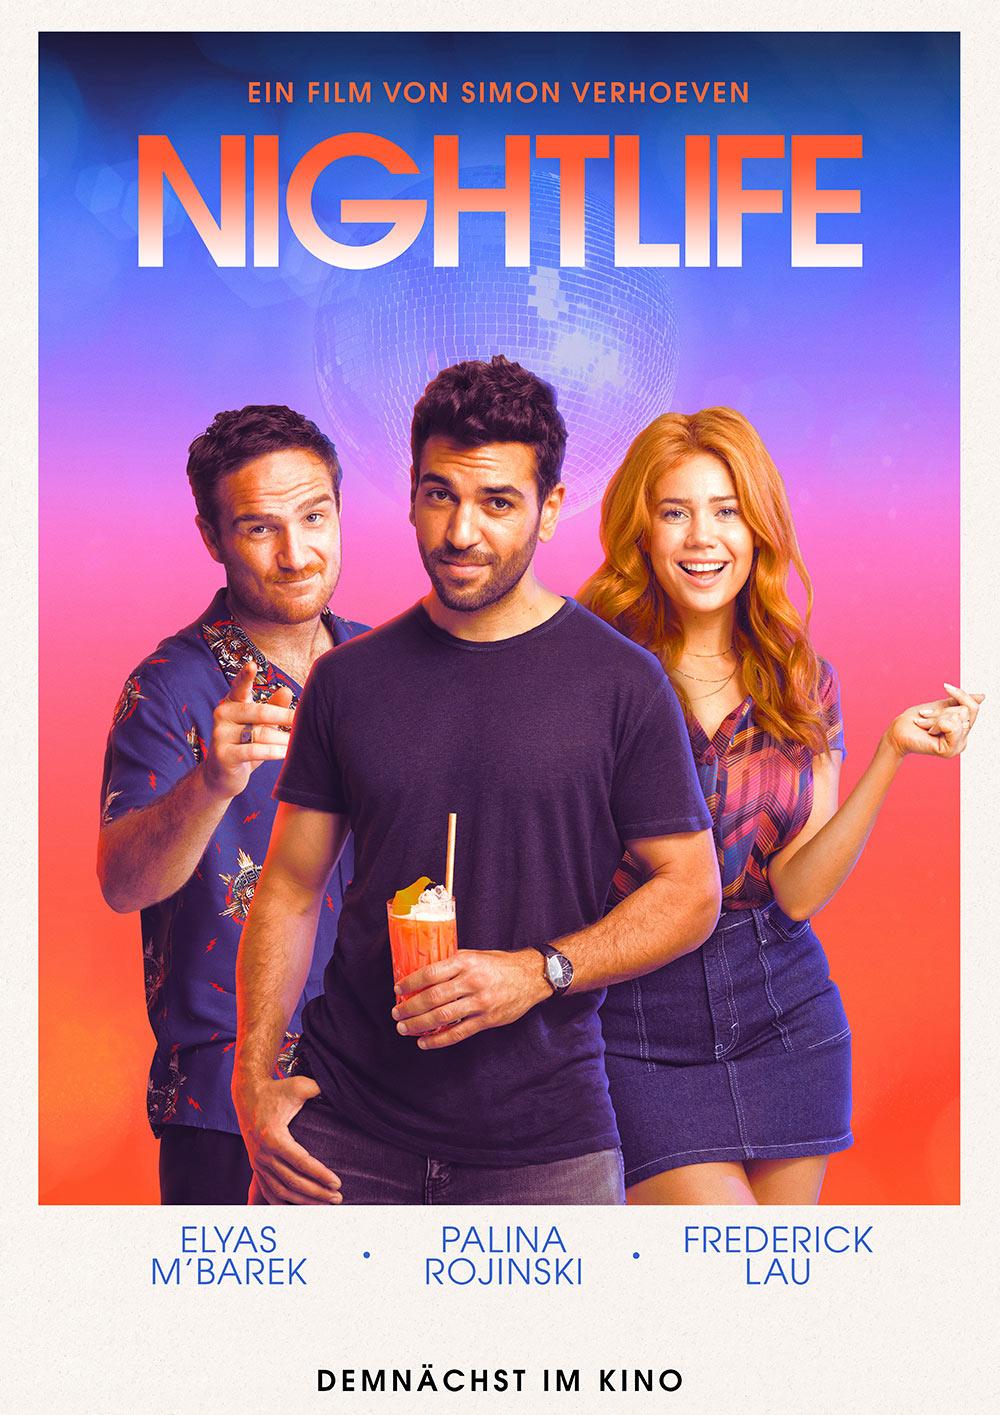 Nightlife Film - Alternative Artwork - Key Visual - 3